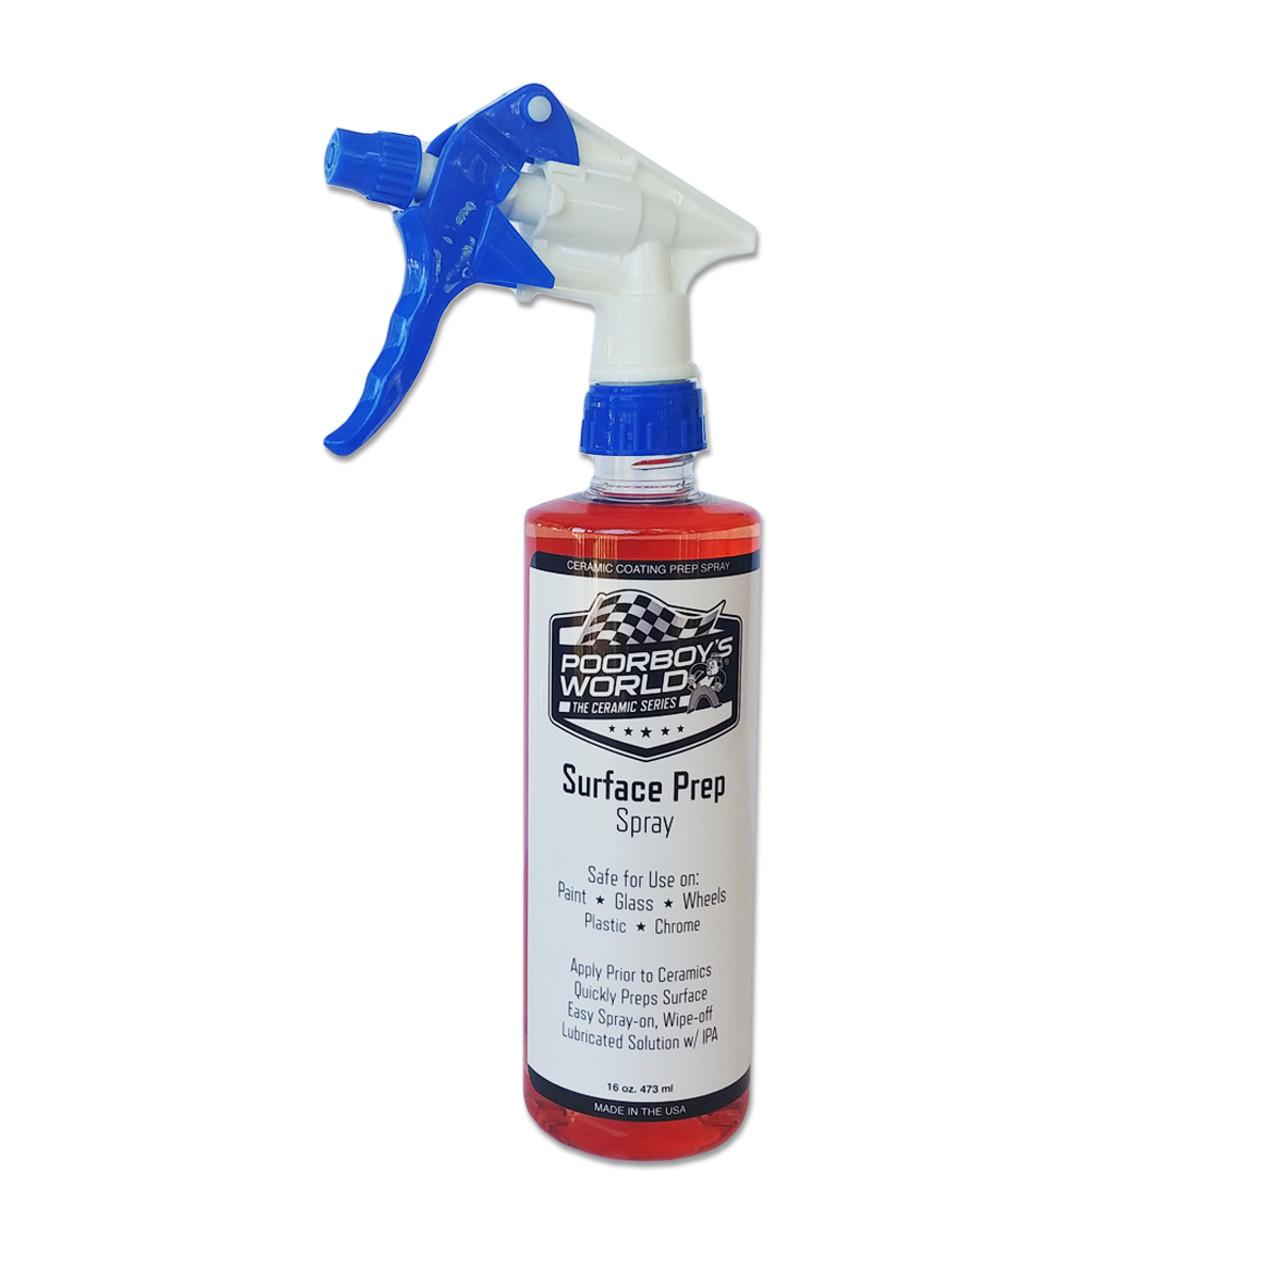 Poorboy's World Surface Prep Spray 16 oz w/ Sprayer